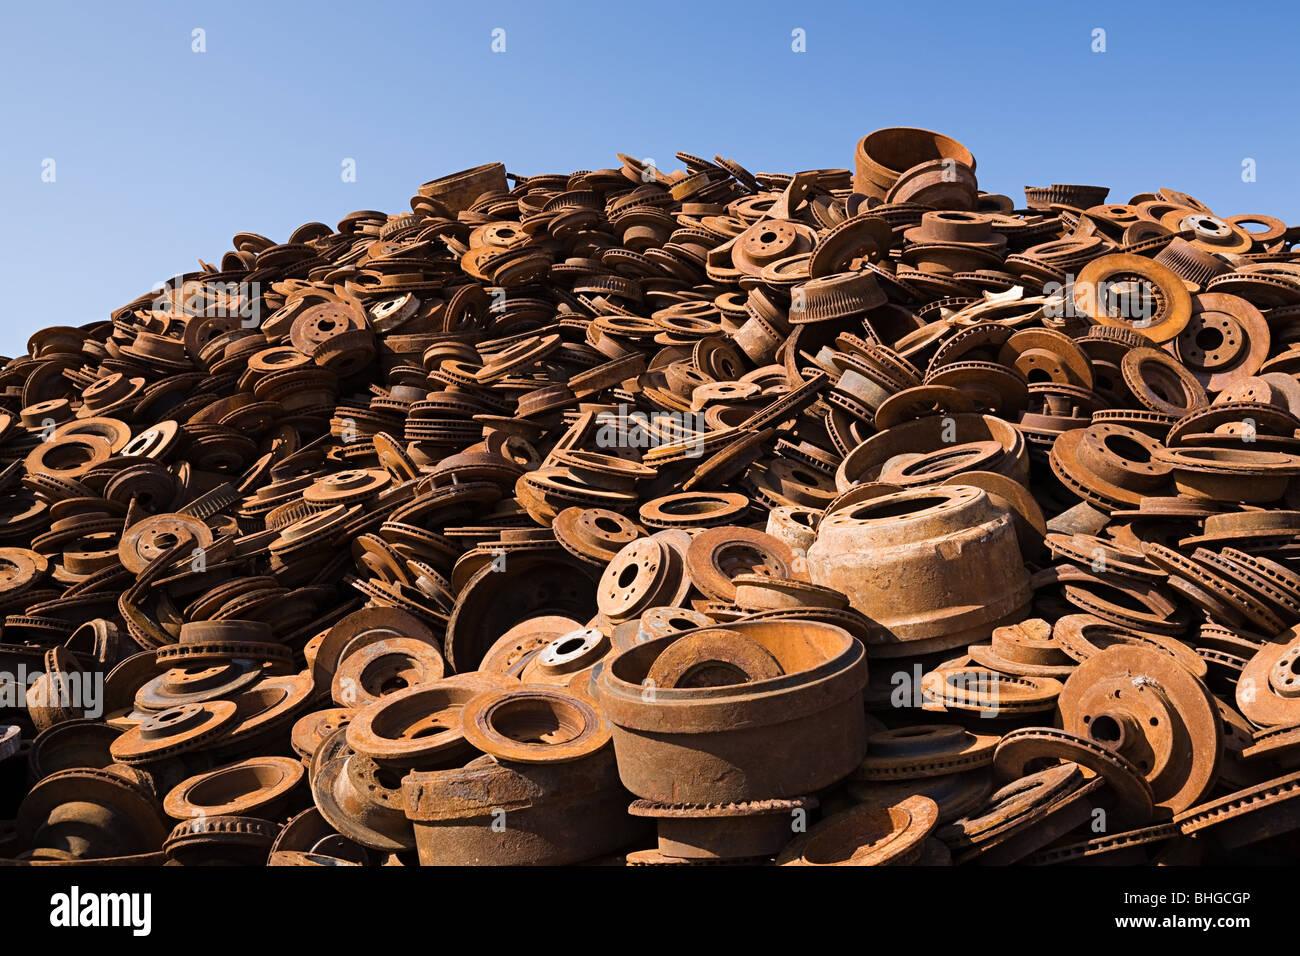 Stack of rusting metal - Stock Image